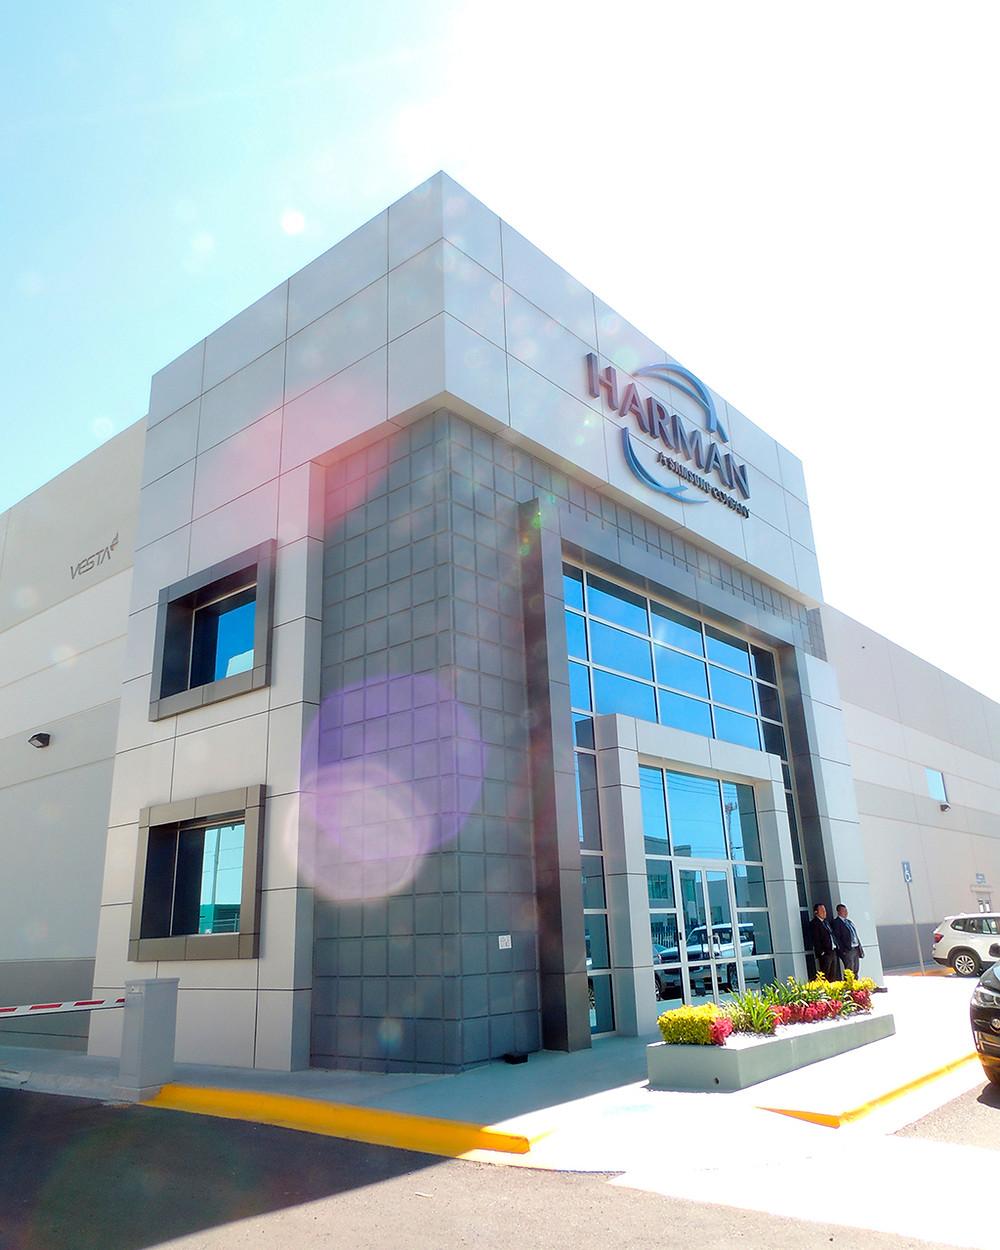 Harman Querétaro, Centro de Ingeniería de Manufactura Avanzada